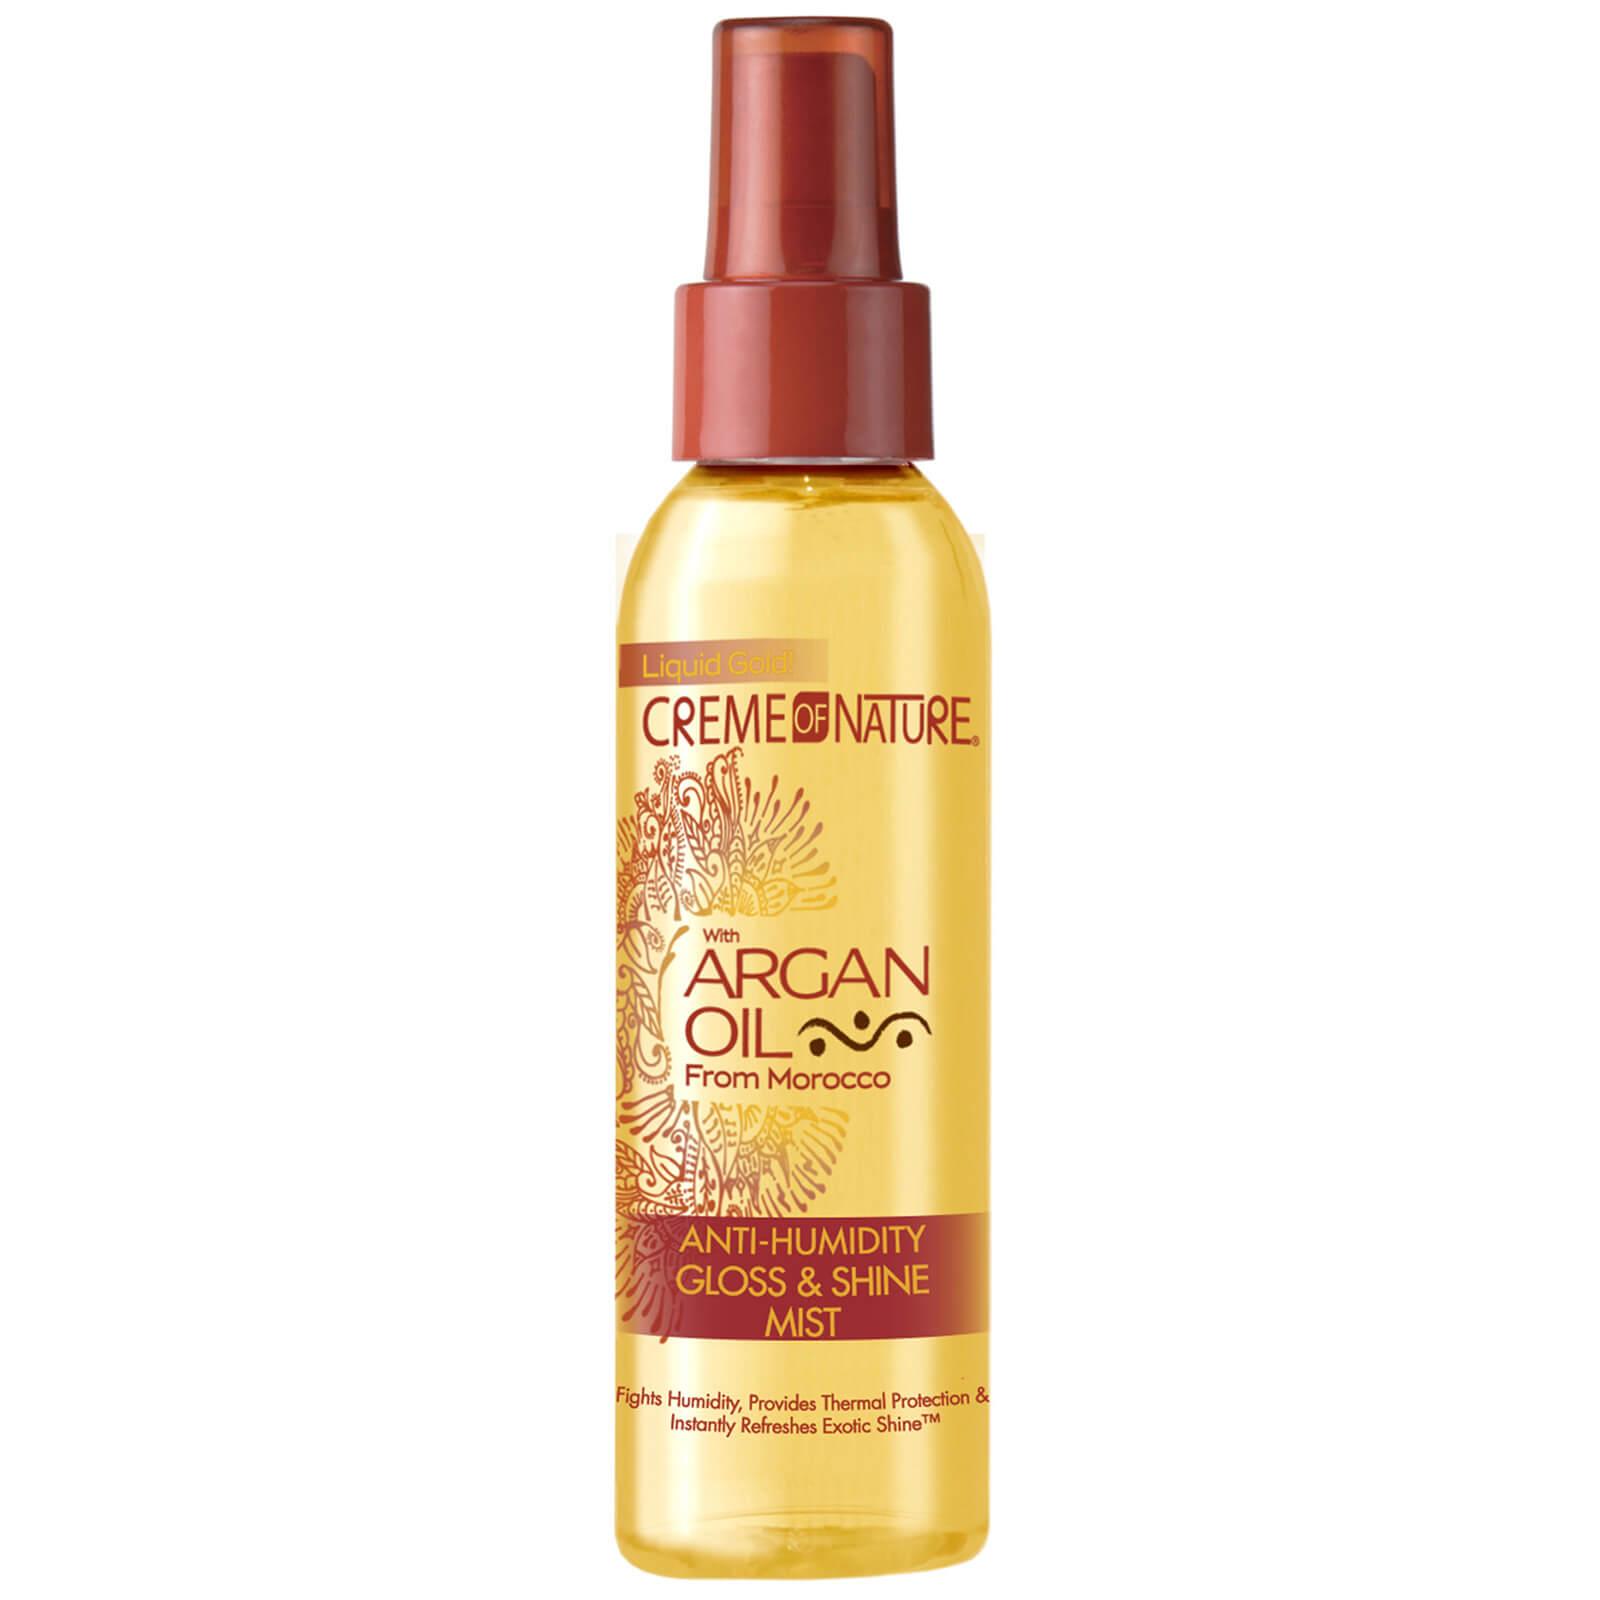 Crème of Nature Argan Oil Anti-Humidity Gloss & Shine Mist 113ml